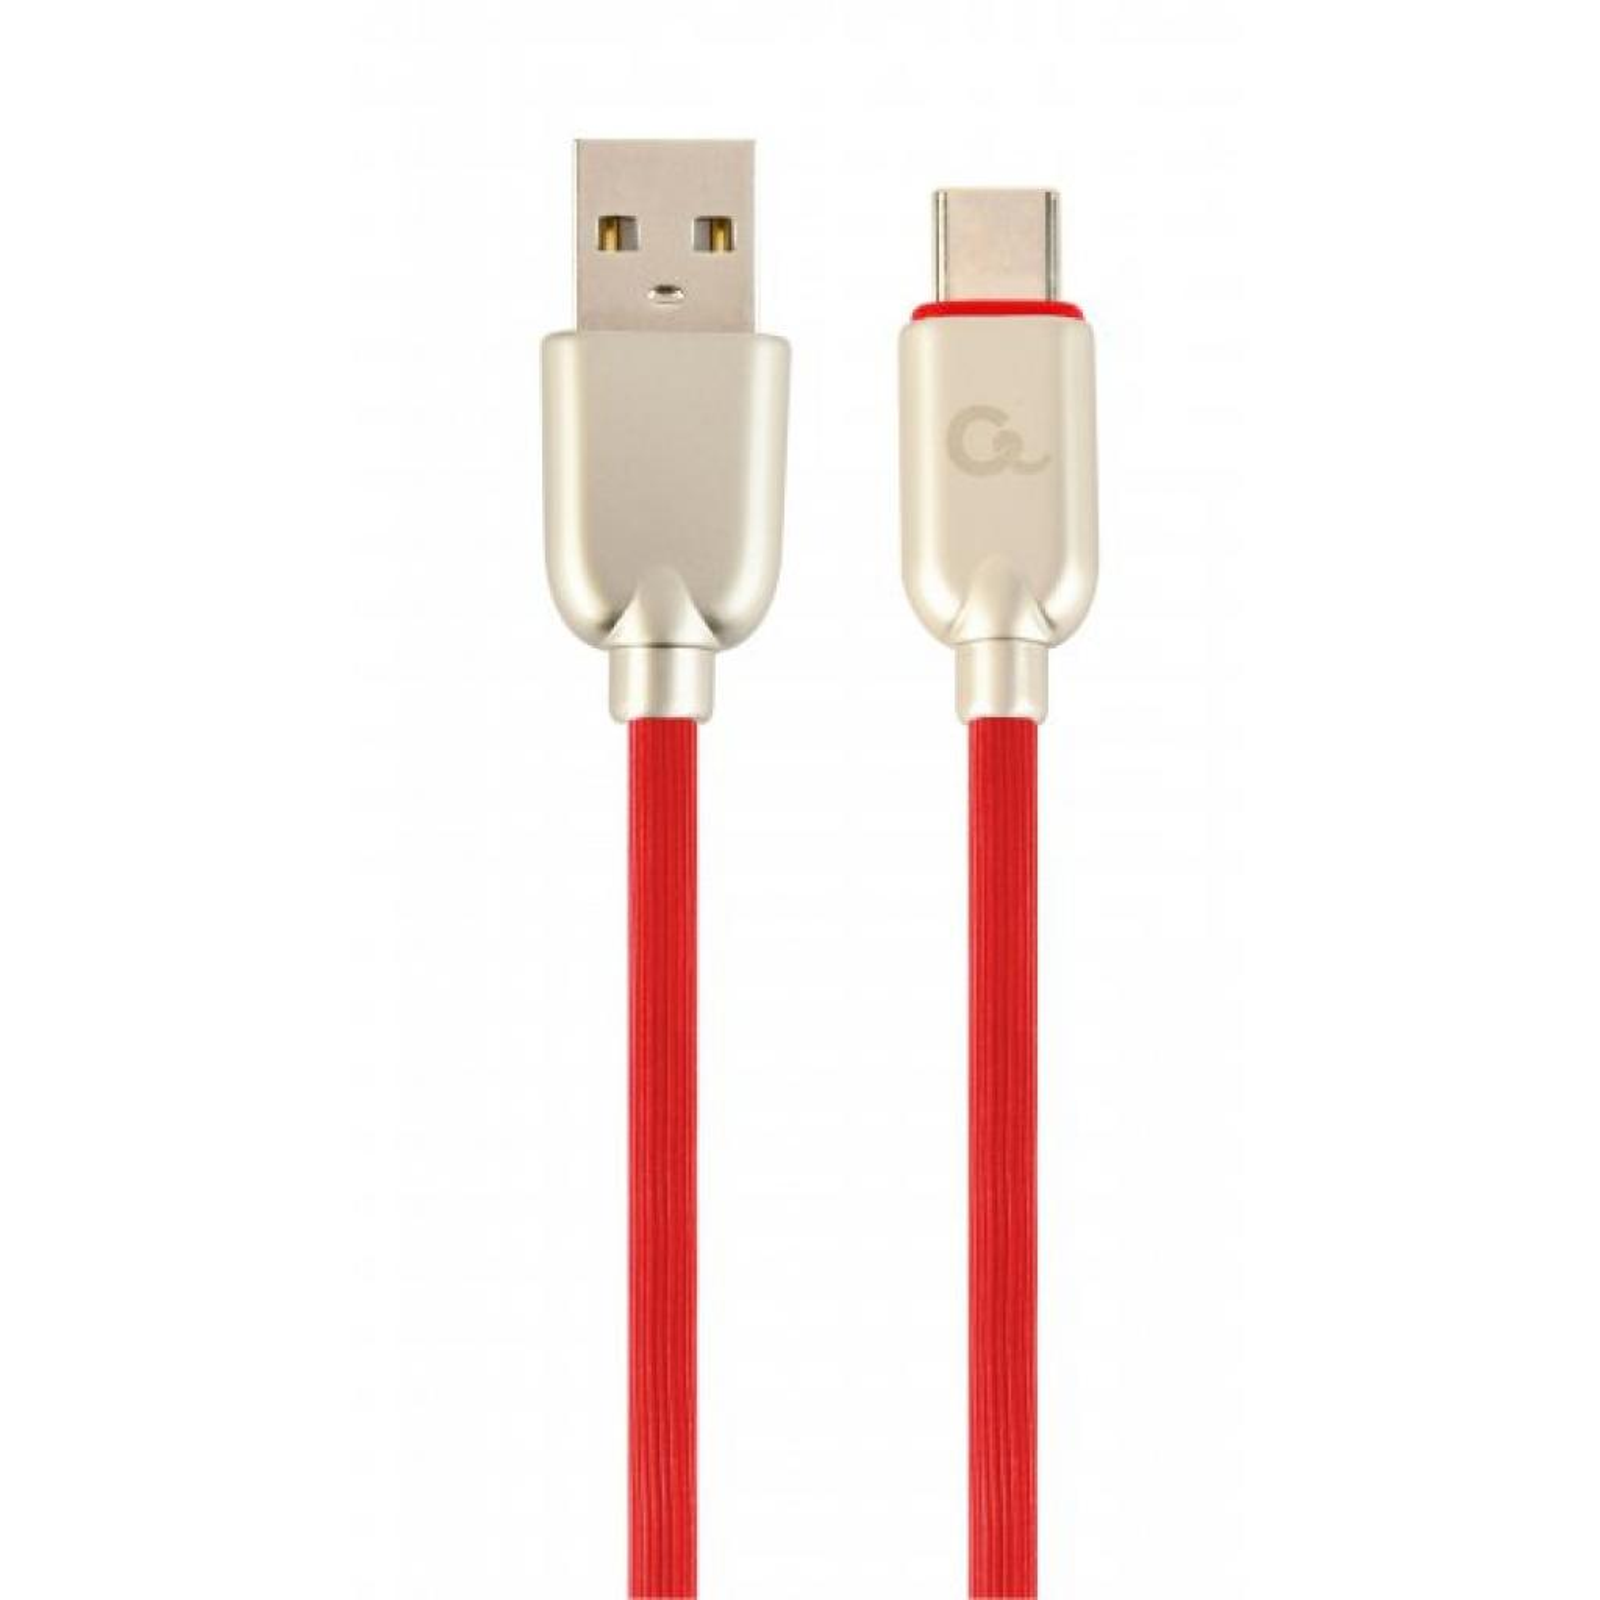 Дата кабель USB 2.0 AM to Type-C 2.0m Cablexpert (CC-USB2R-AMCM-2M-W)